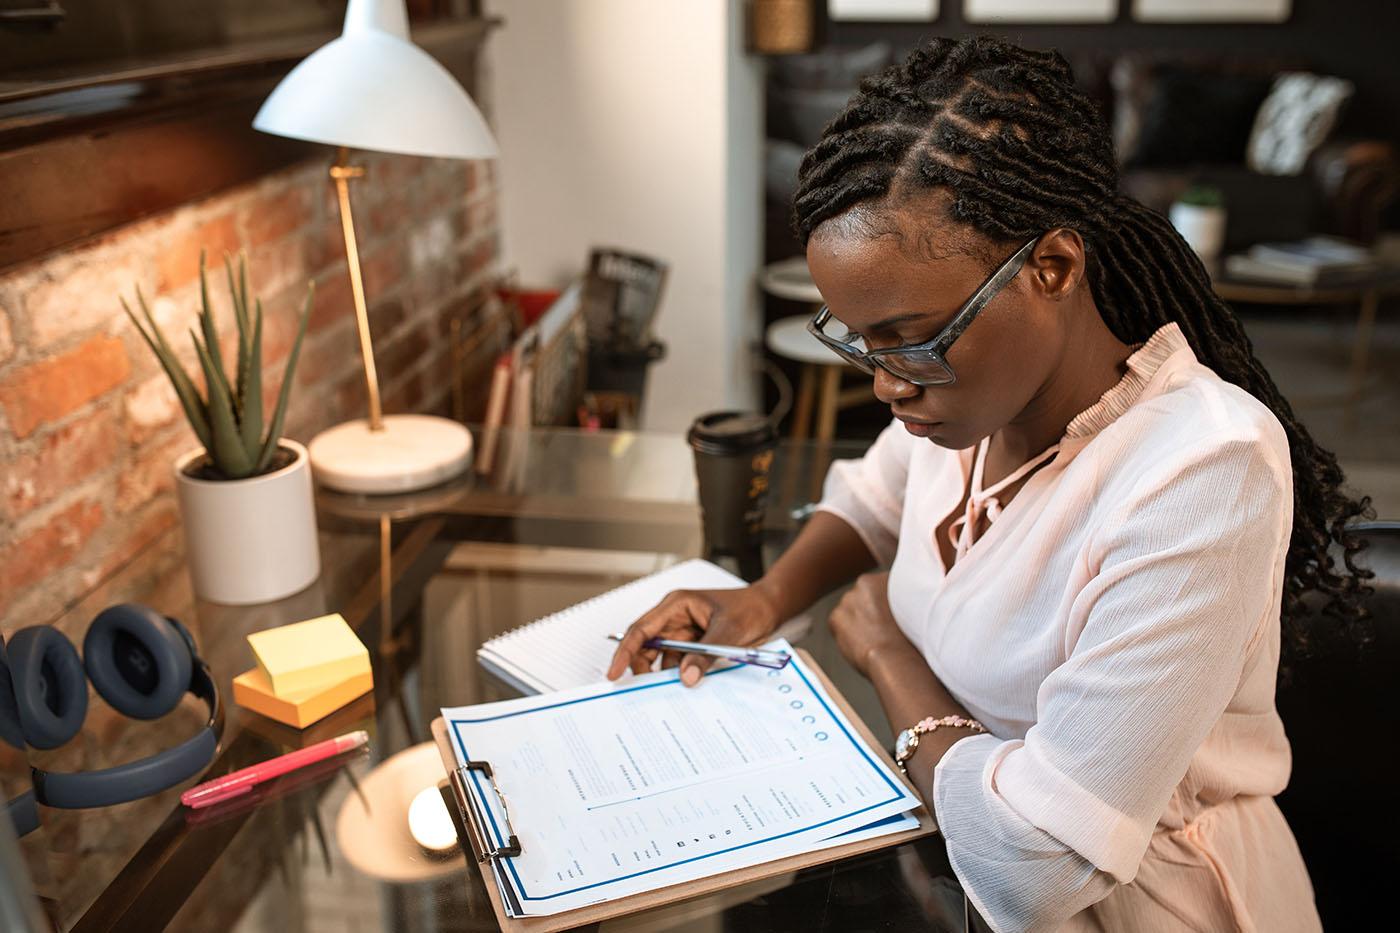 Black woman looking at clipboard